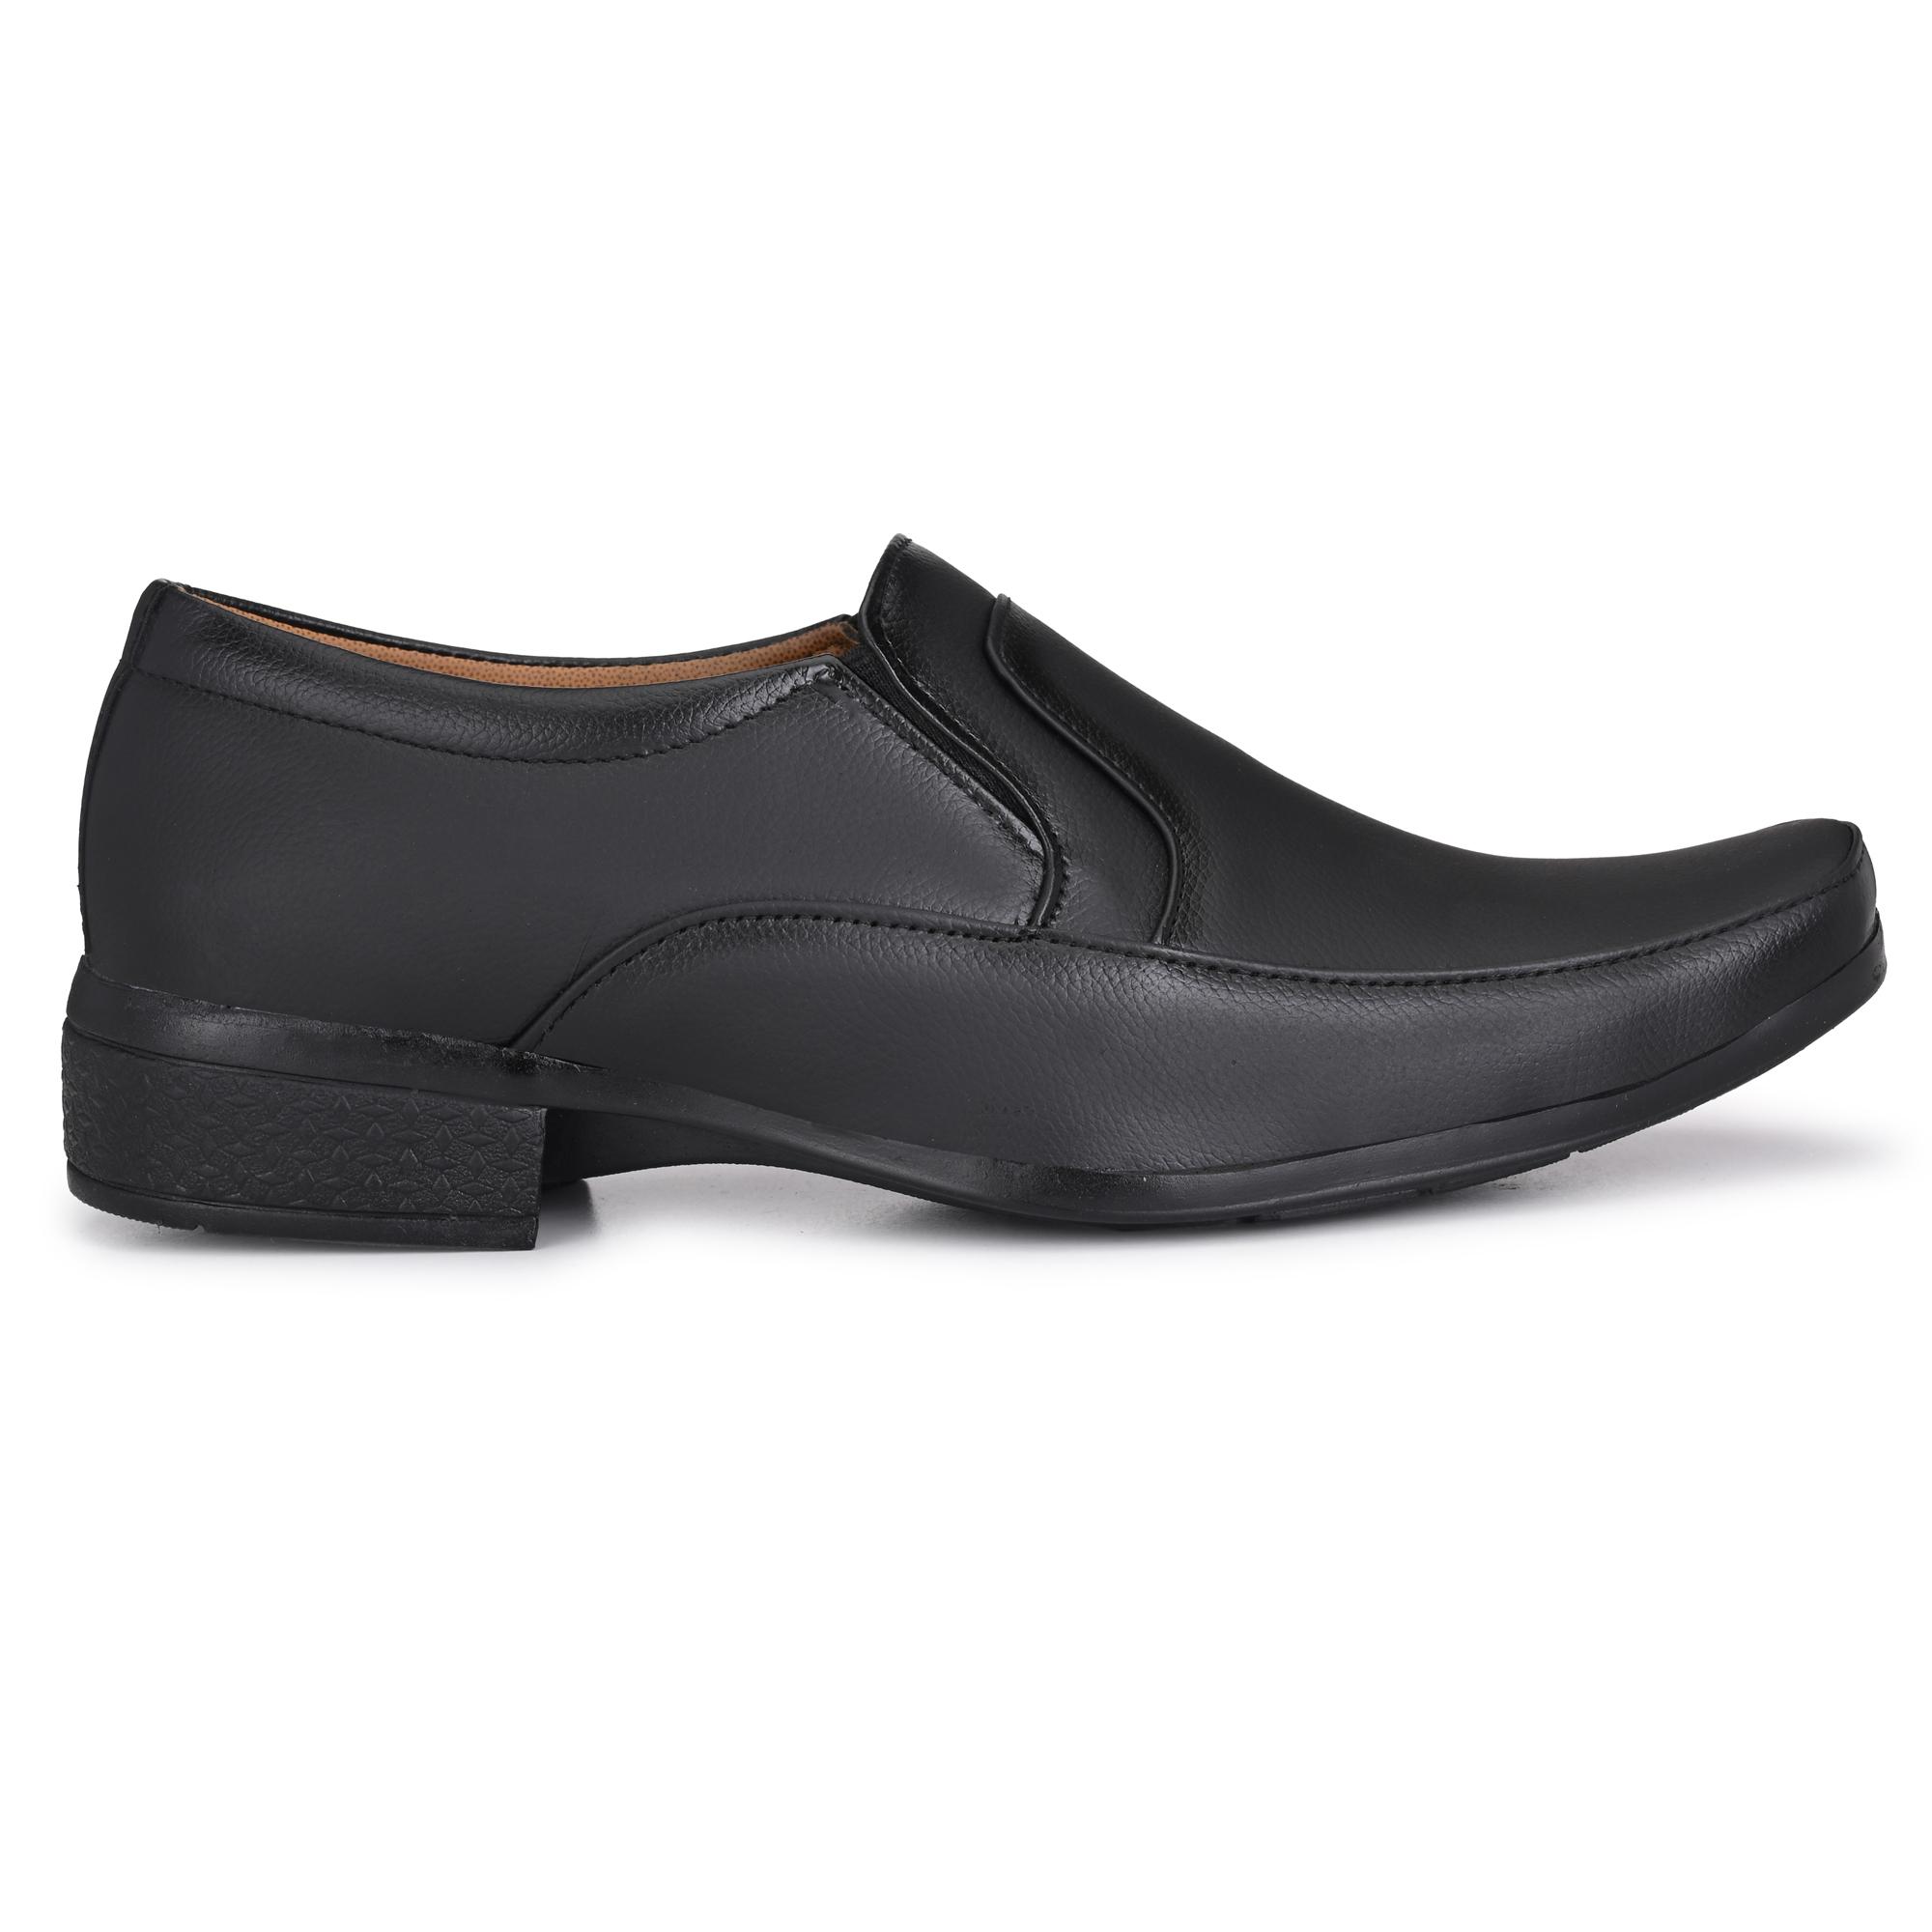 Dazzer 588 Slip On Synthetic Formal Shoes For Men 588Black (Black, 6-10, 8 PAIR)